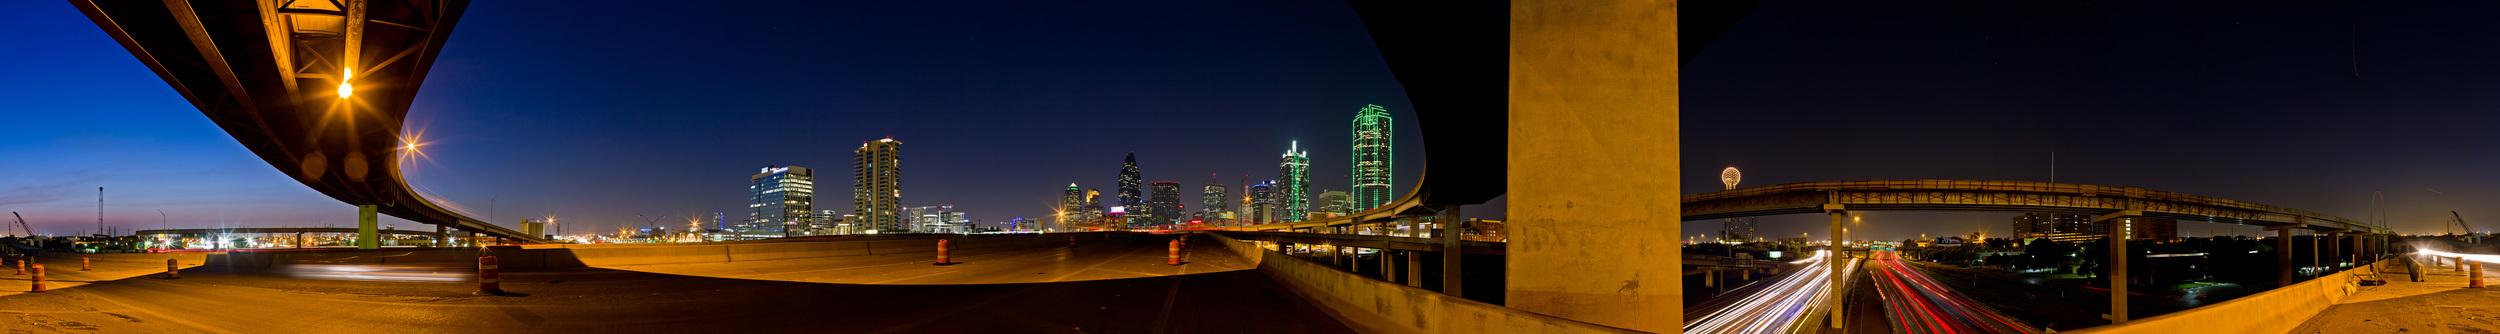 Dallas-Skyline-Woodall-Rogers-Construction.jpg